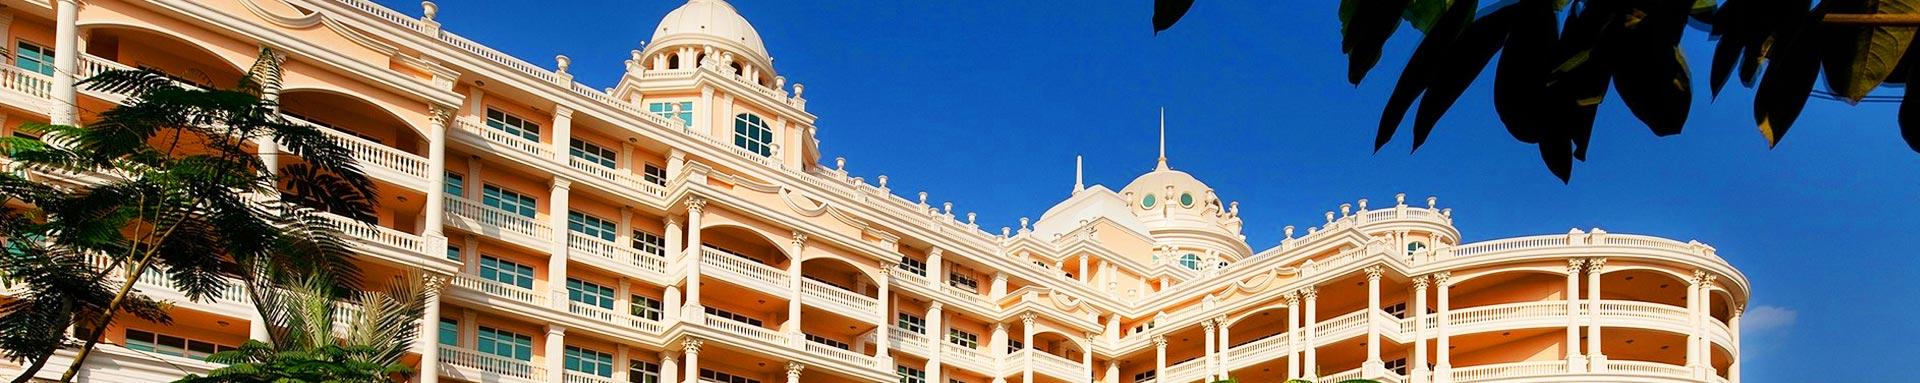 Kempinski Hotel Residences - Palm Jumeirah